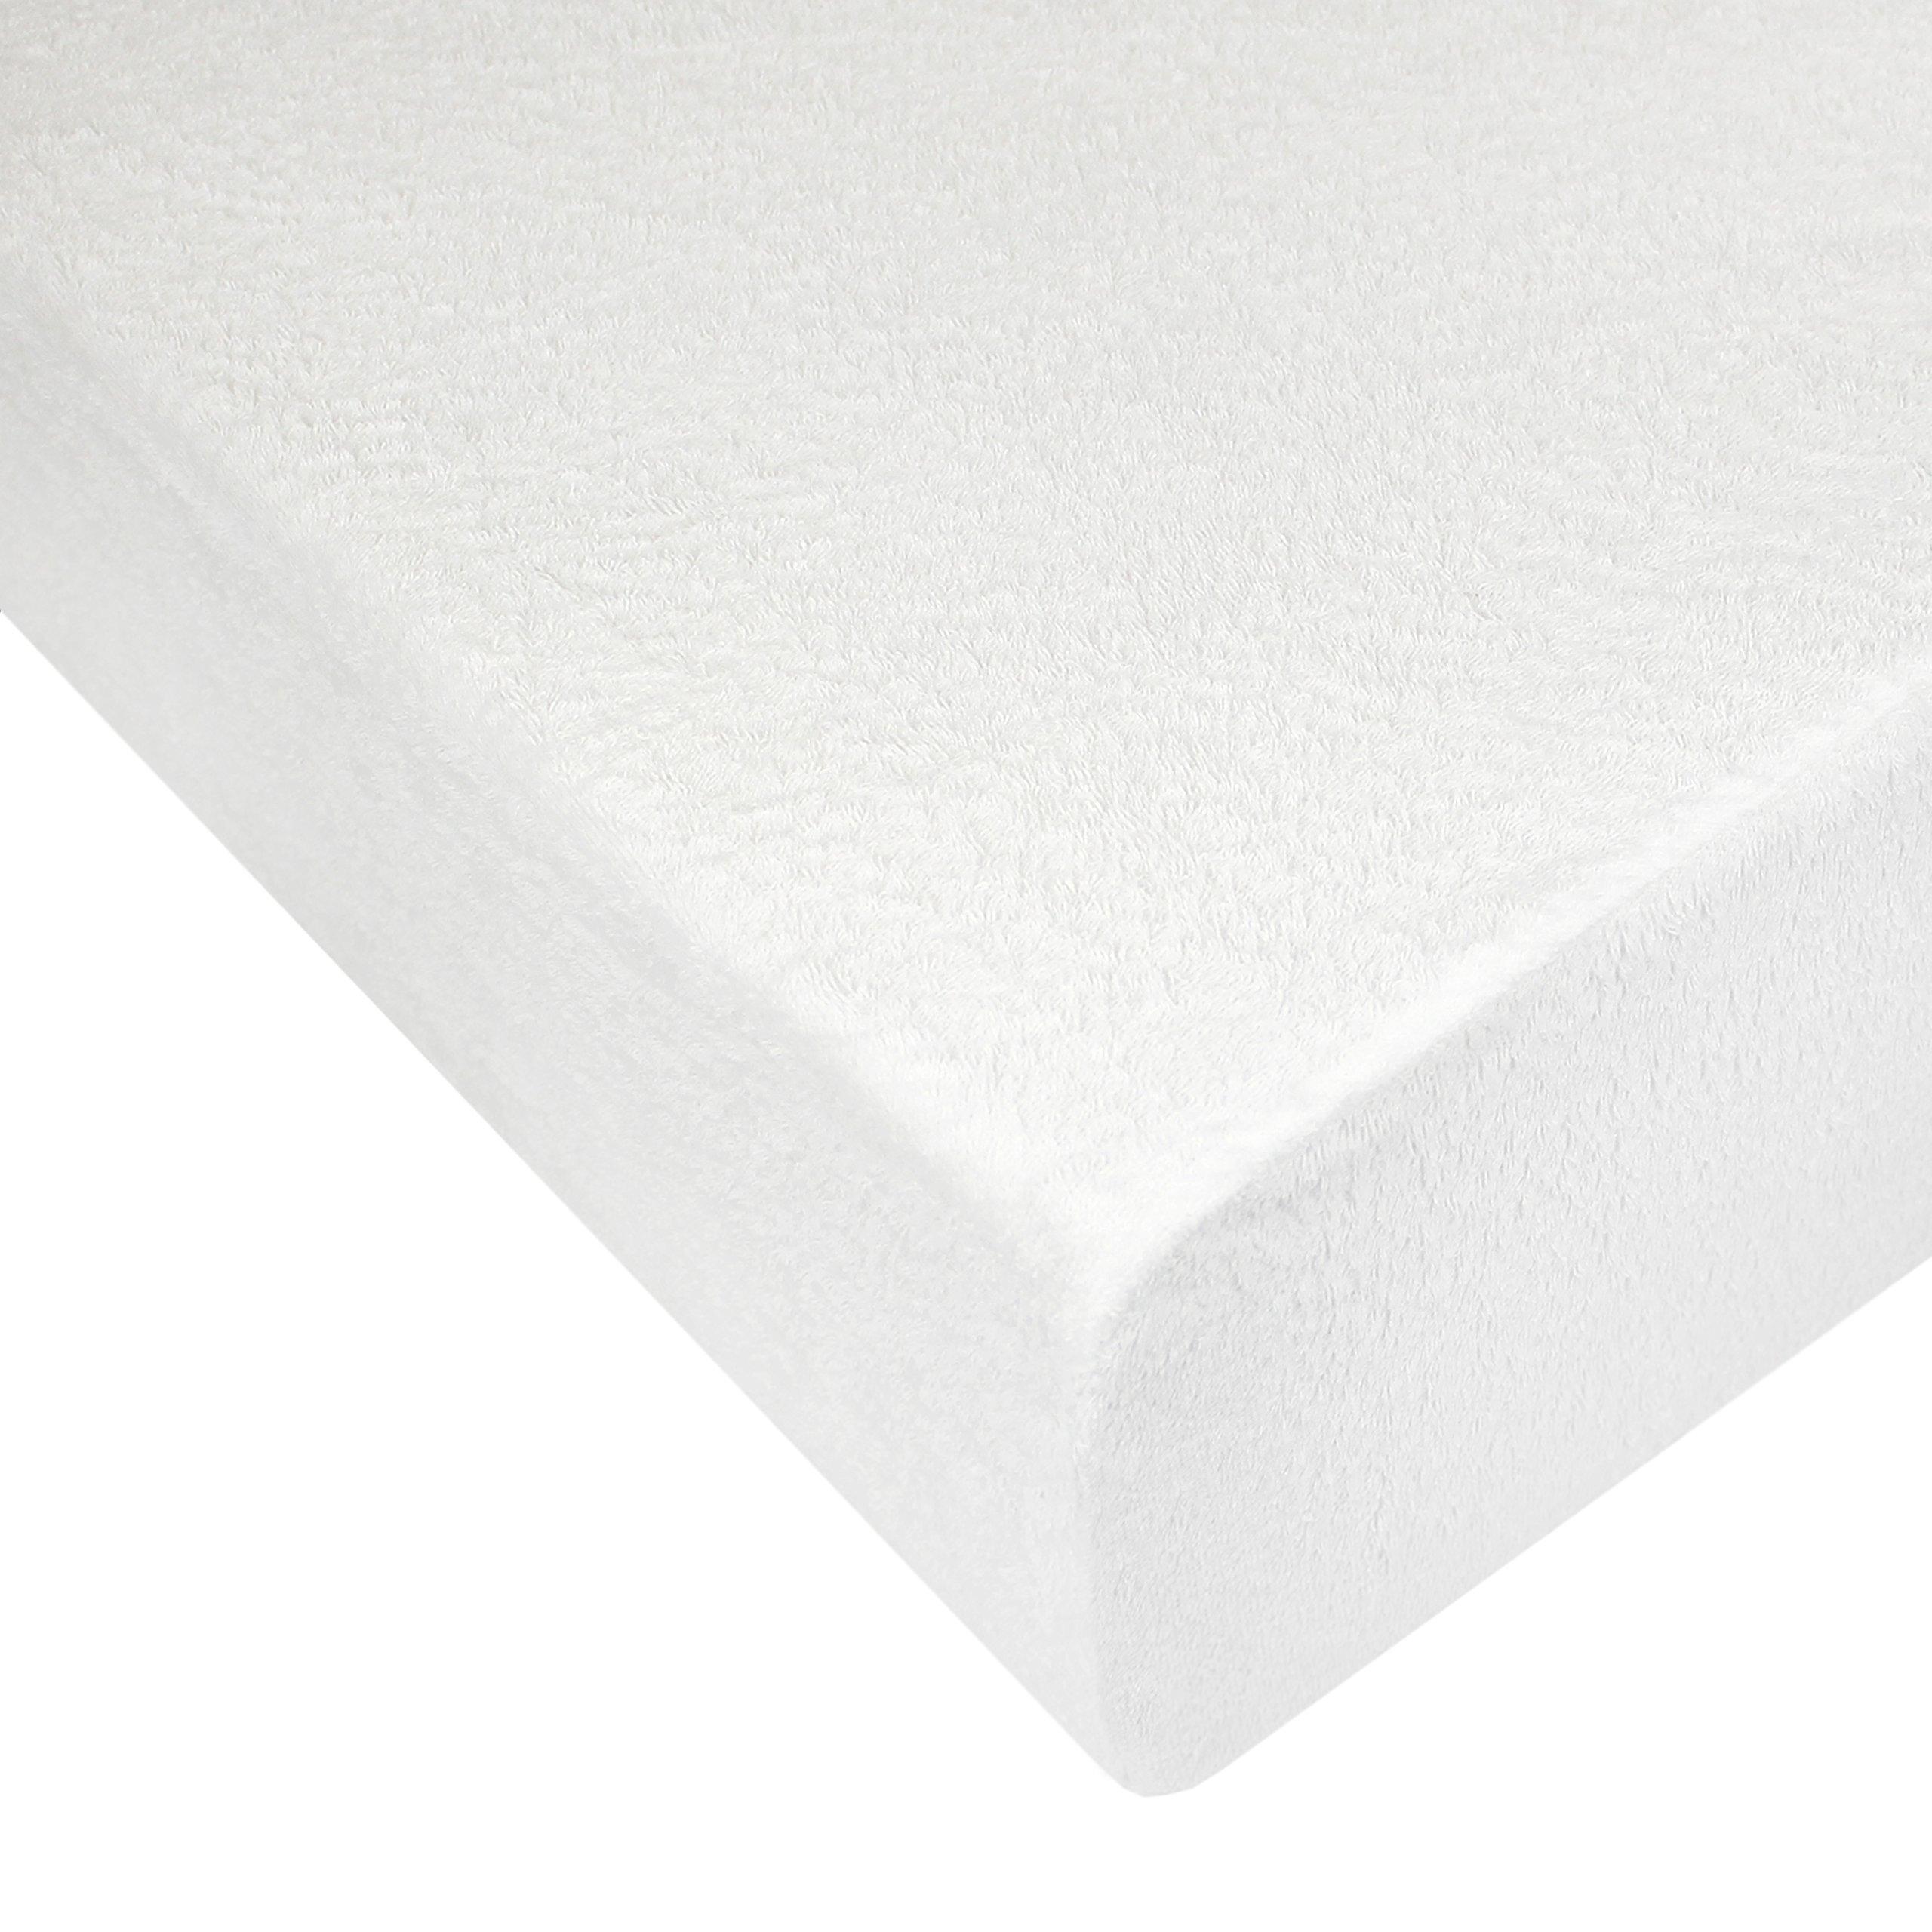 Century Home C670-001 Proguard Cotton Terry Mattress Protector, Crib